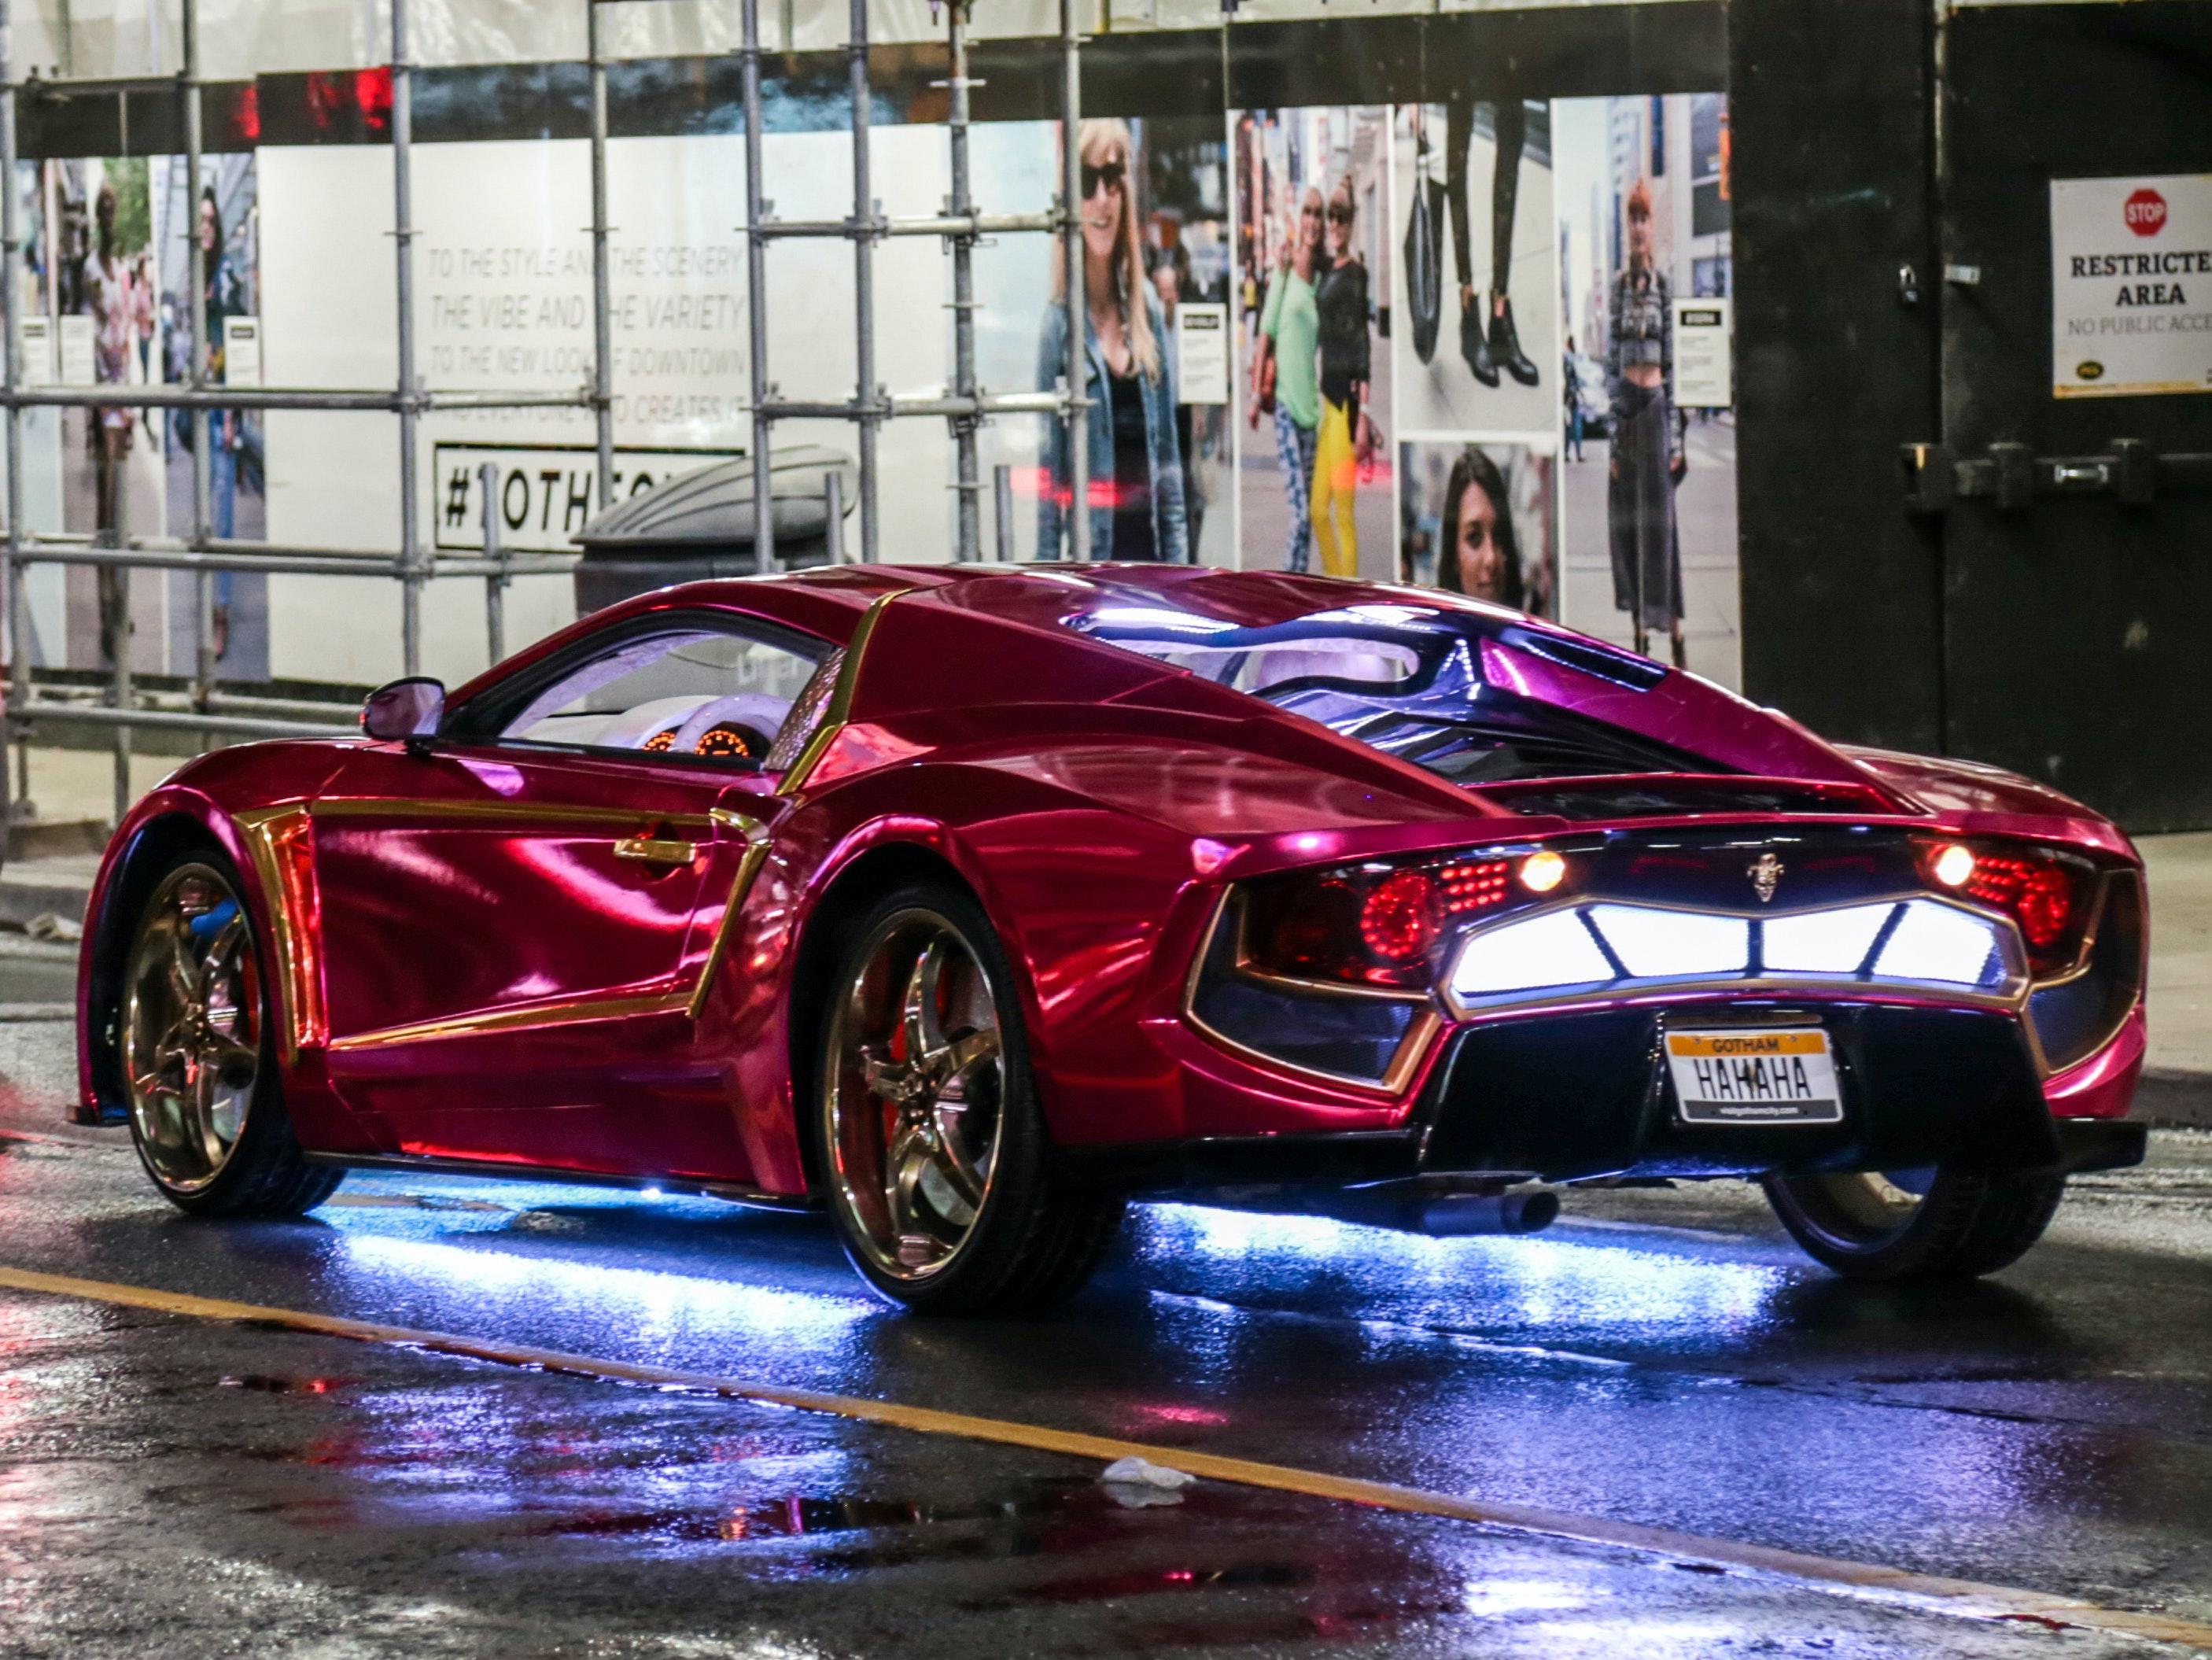 Joker's Car in 'Suicide Squad'